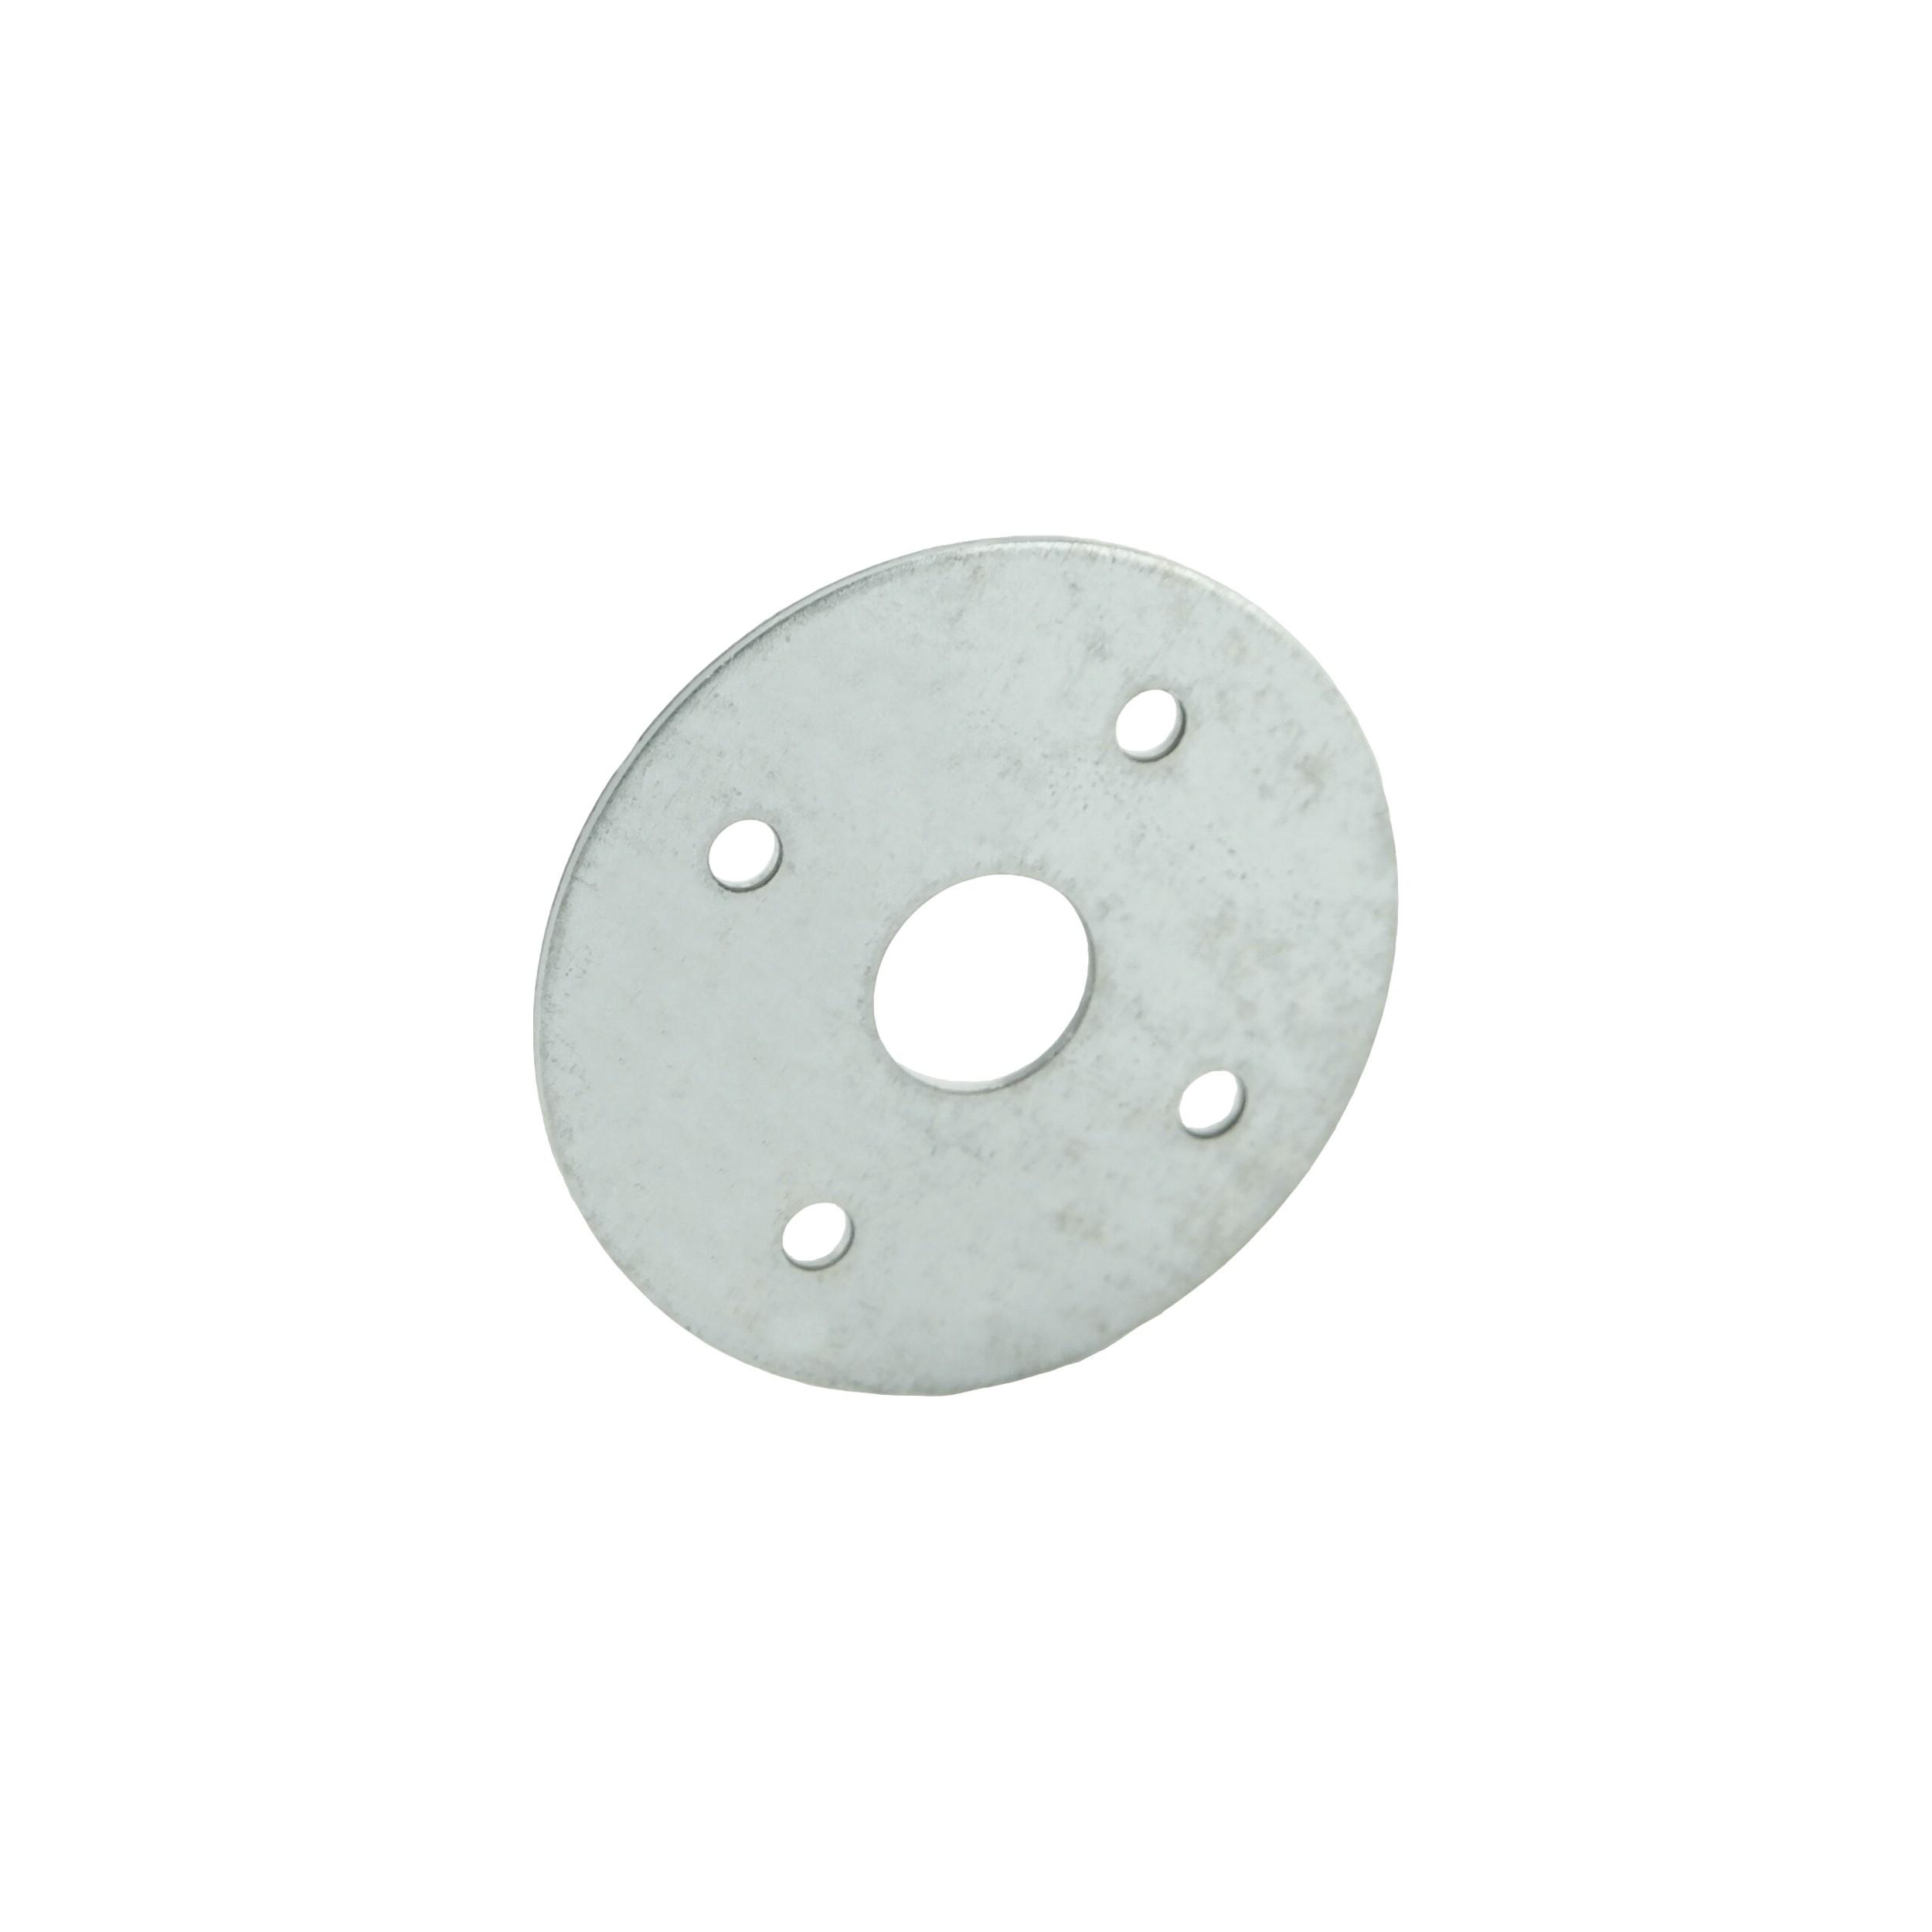 Loquet type paysan plaque Ø50 1,25 SV